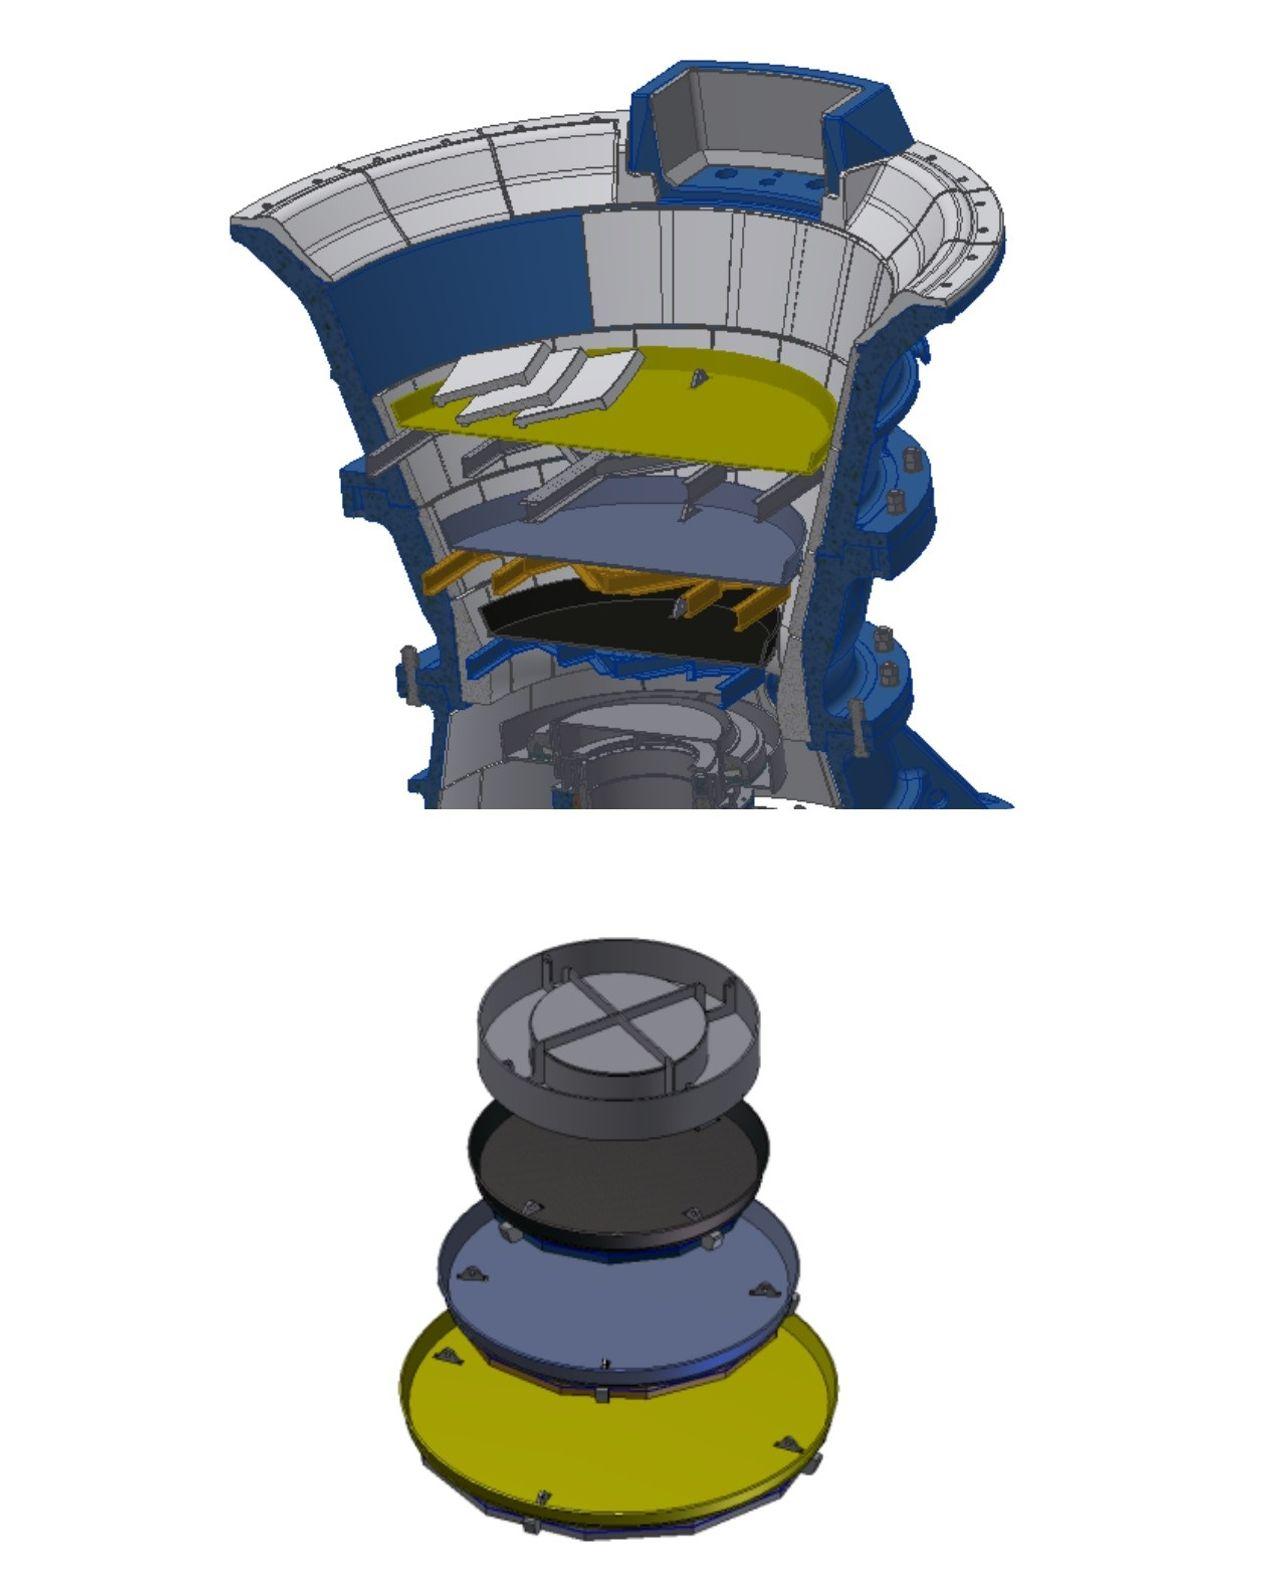 Dismantling Device: Advanced concave change out